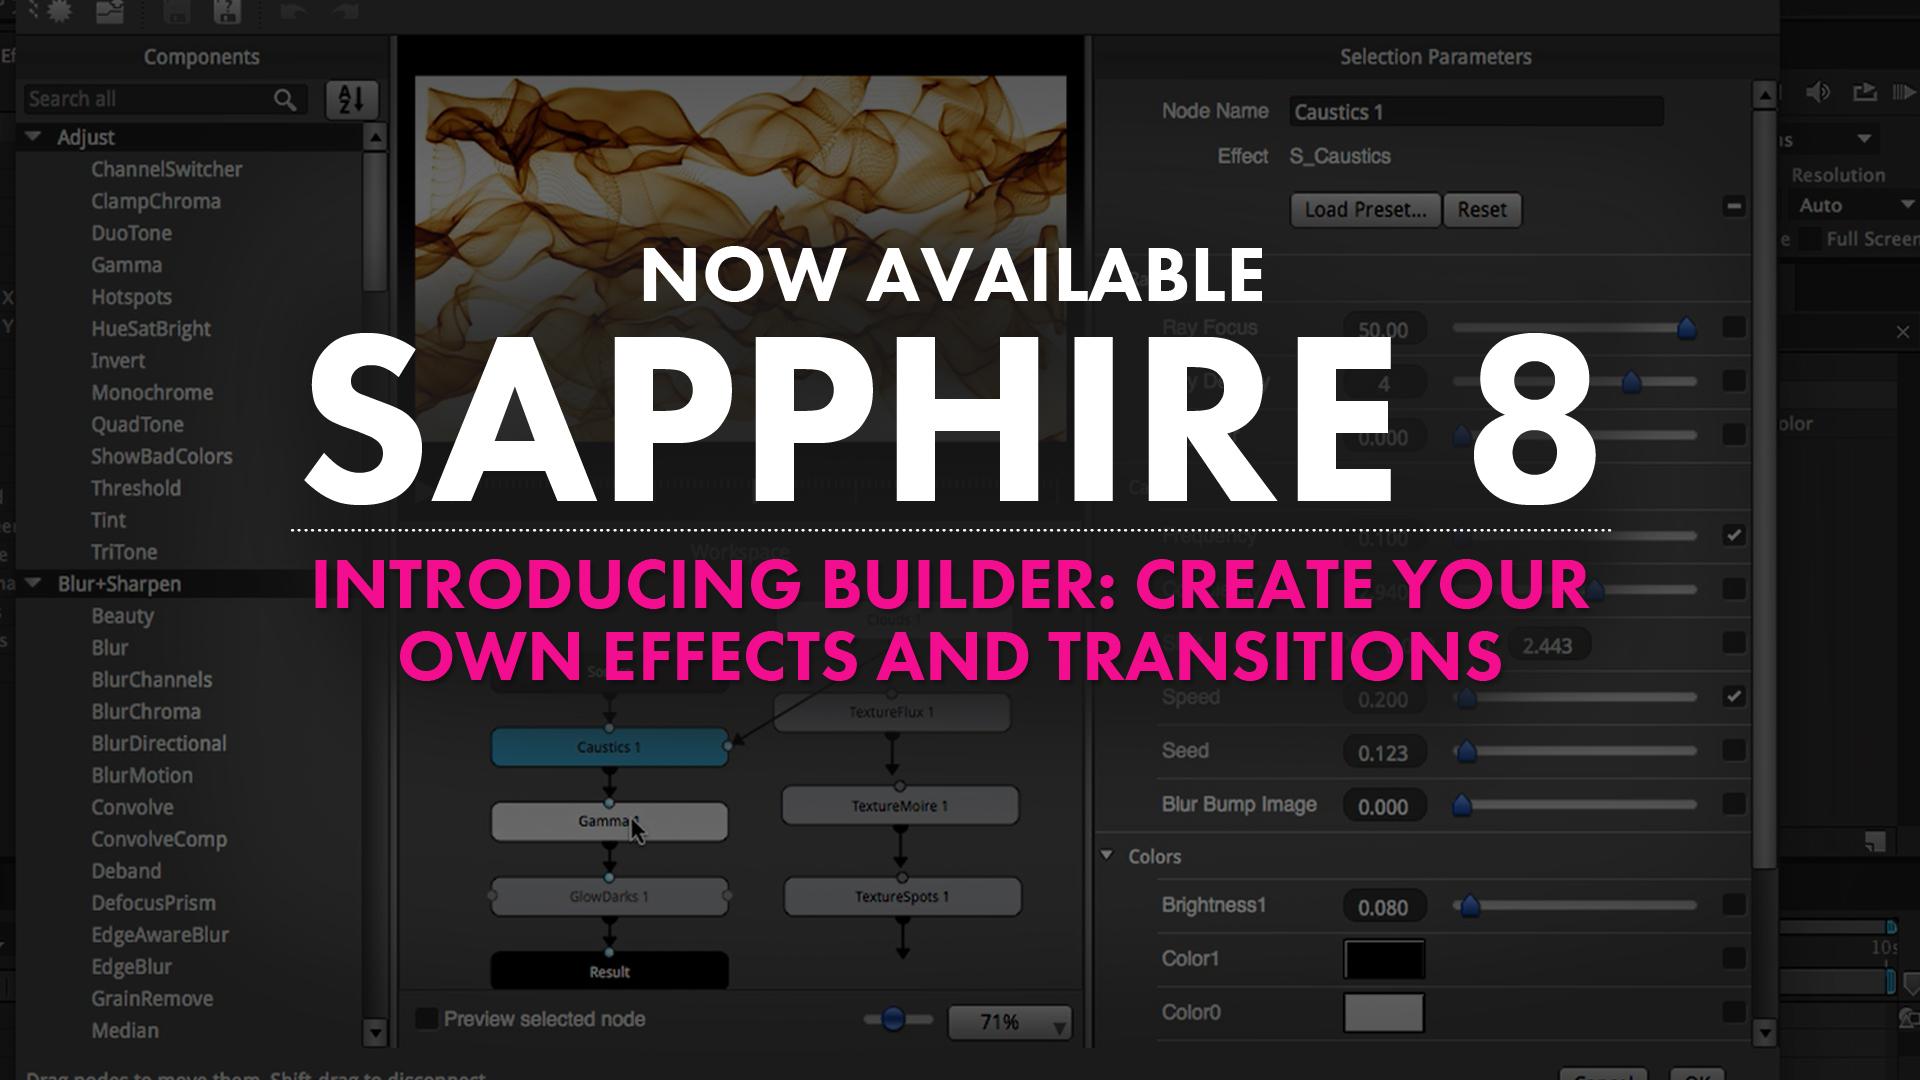 GenArts, Inc. Announces the Release of Sapphire 8 3